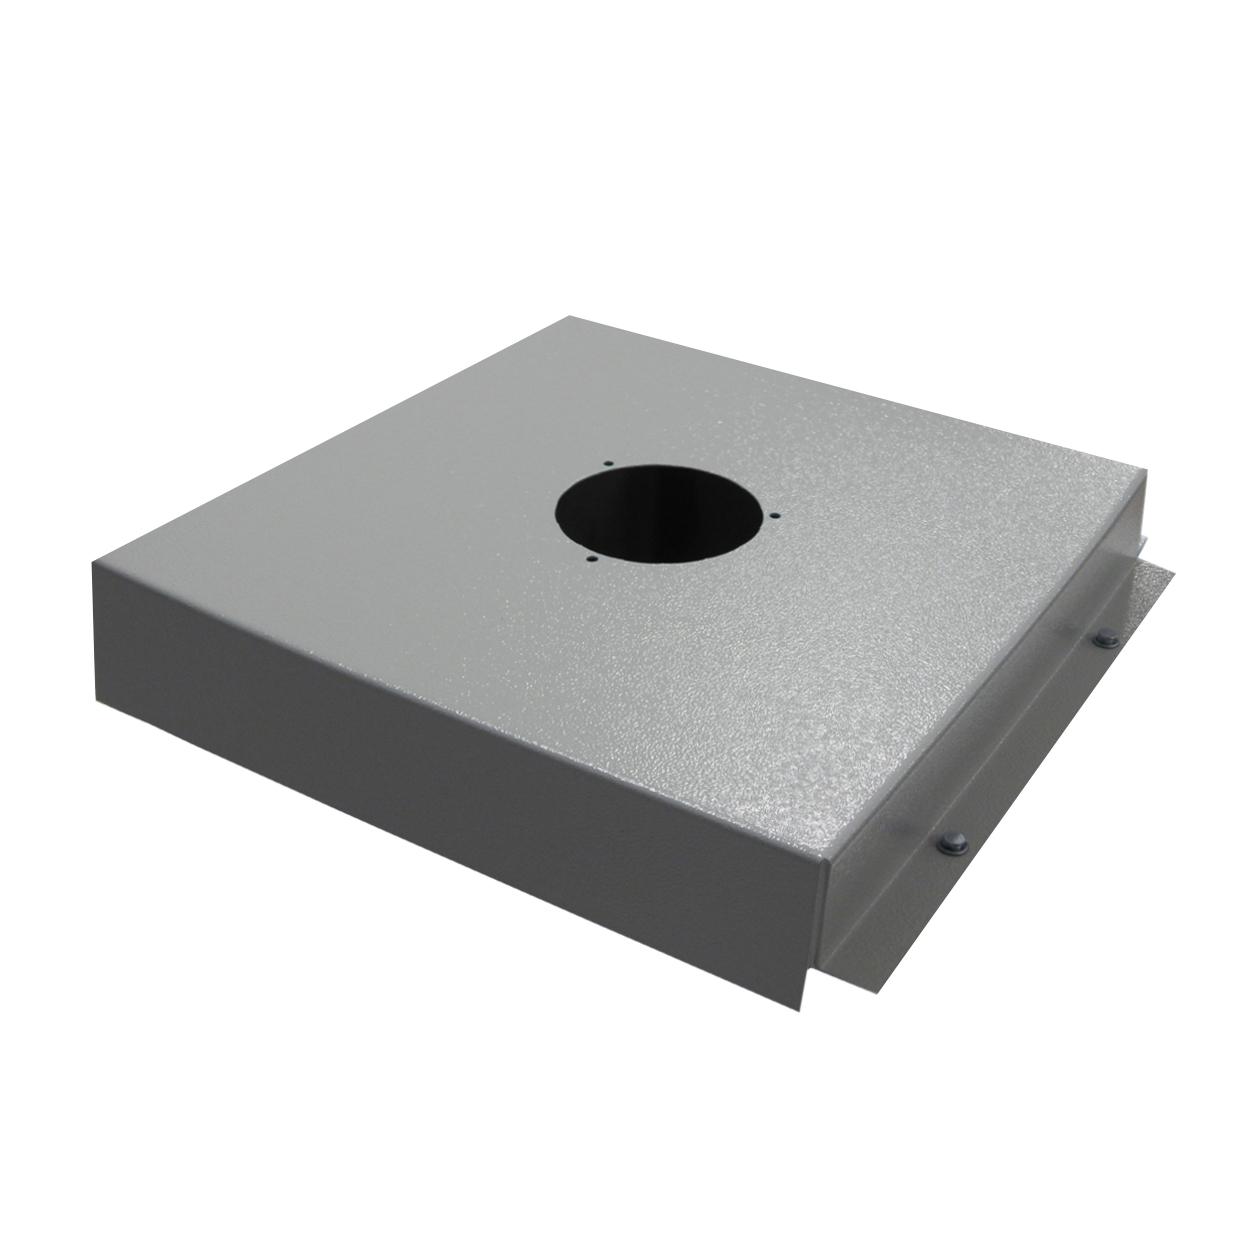 Adaptér k nucené ventilaci s filtrem pro B80-6207-A, B80-621